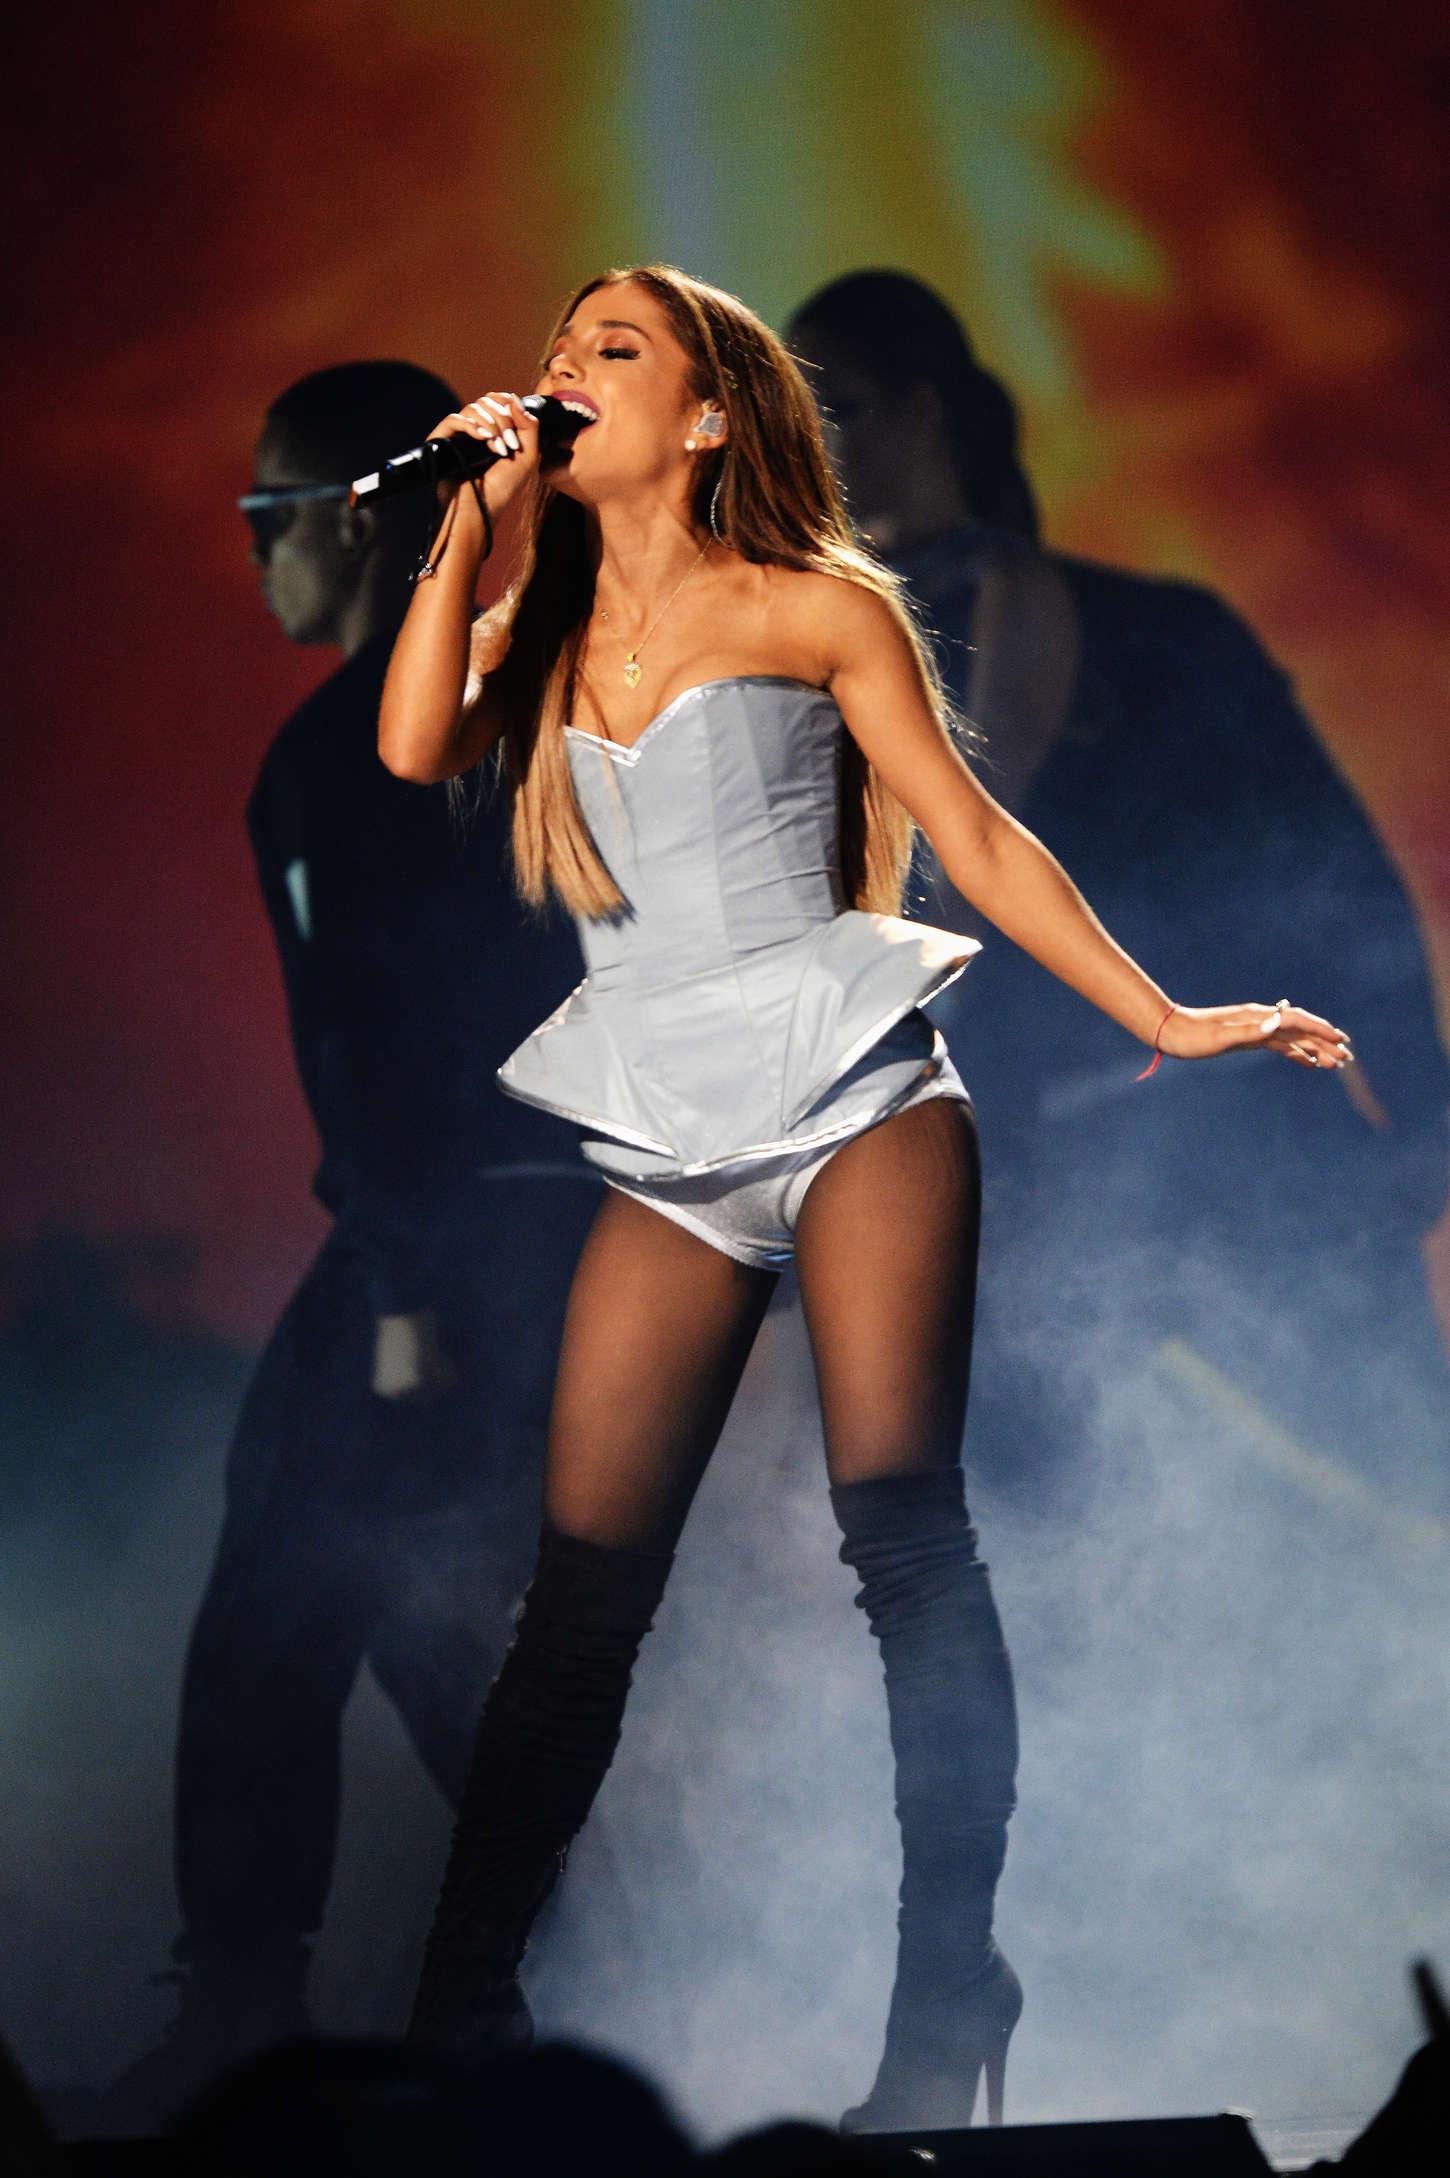 Ariana Grande in Silver Bodysuit at MTV EMA 2014 -22